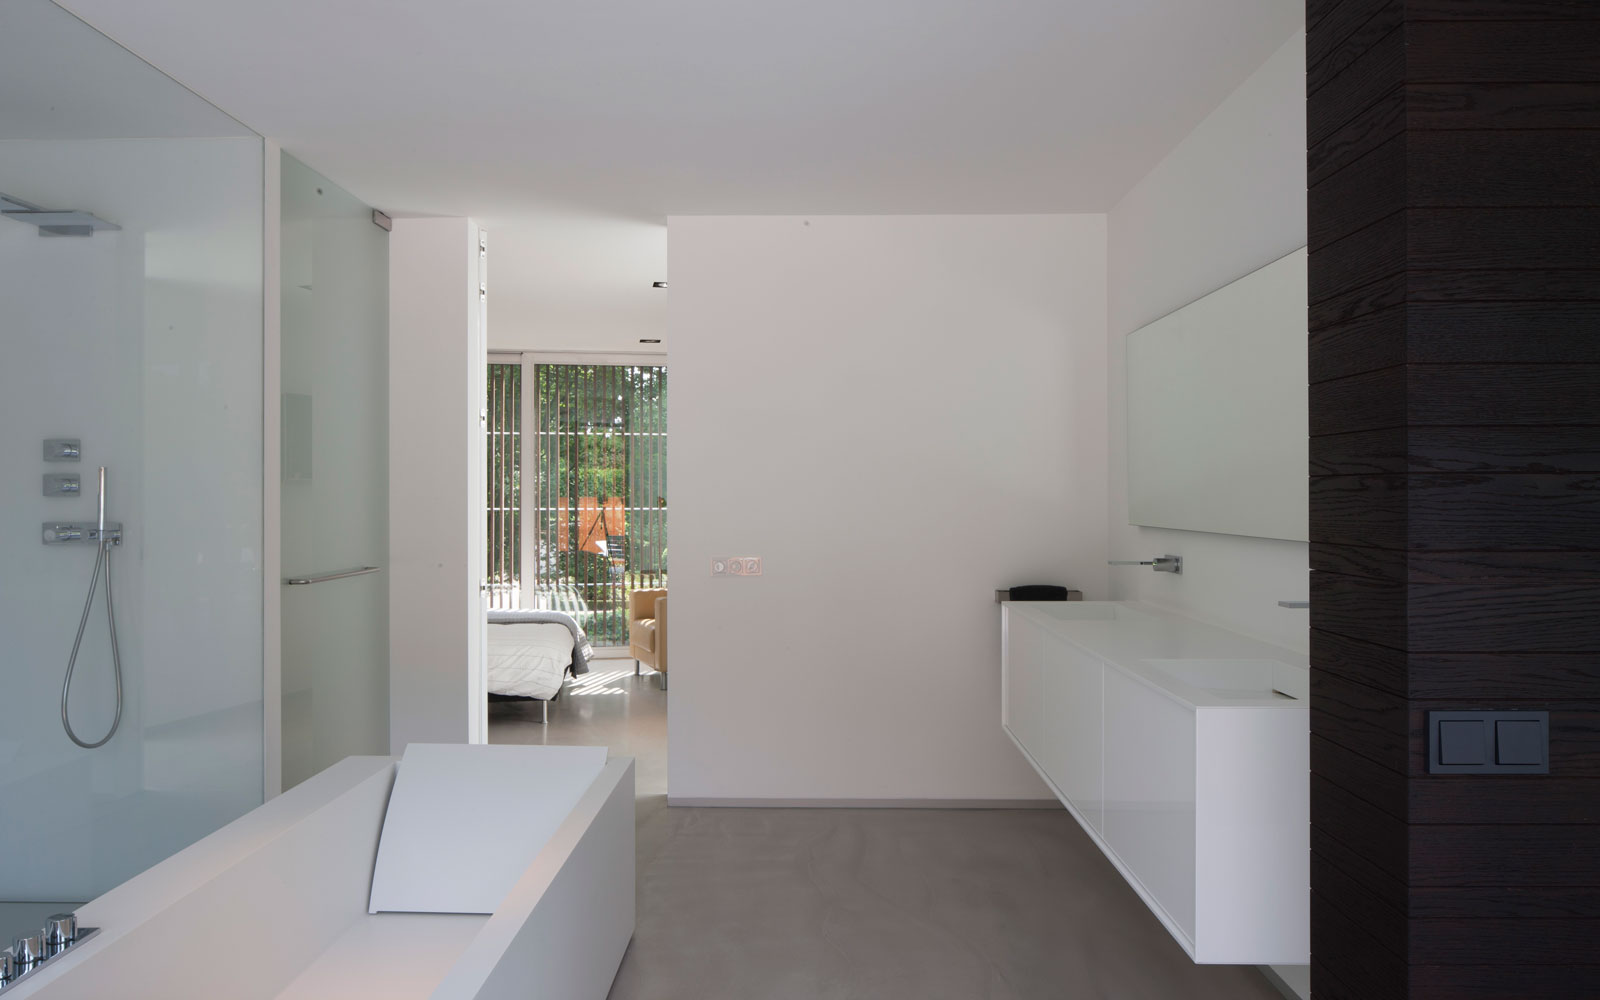 Badkamer, inloopdouche, regendouche, wastafel, sanitair, ruimtelijk, zwevende villa, Lab32 architecten